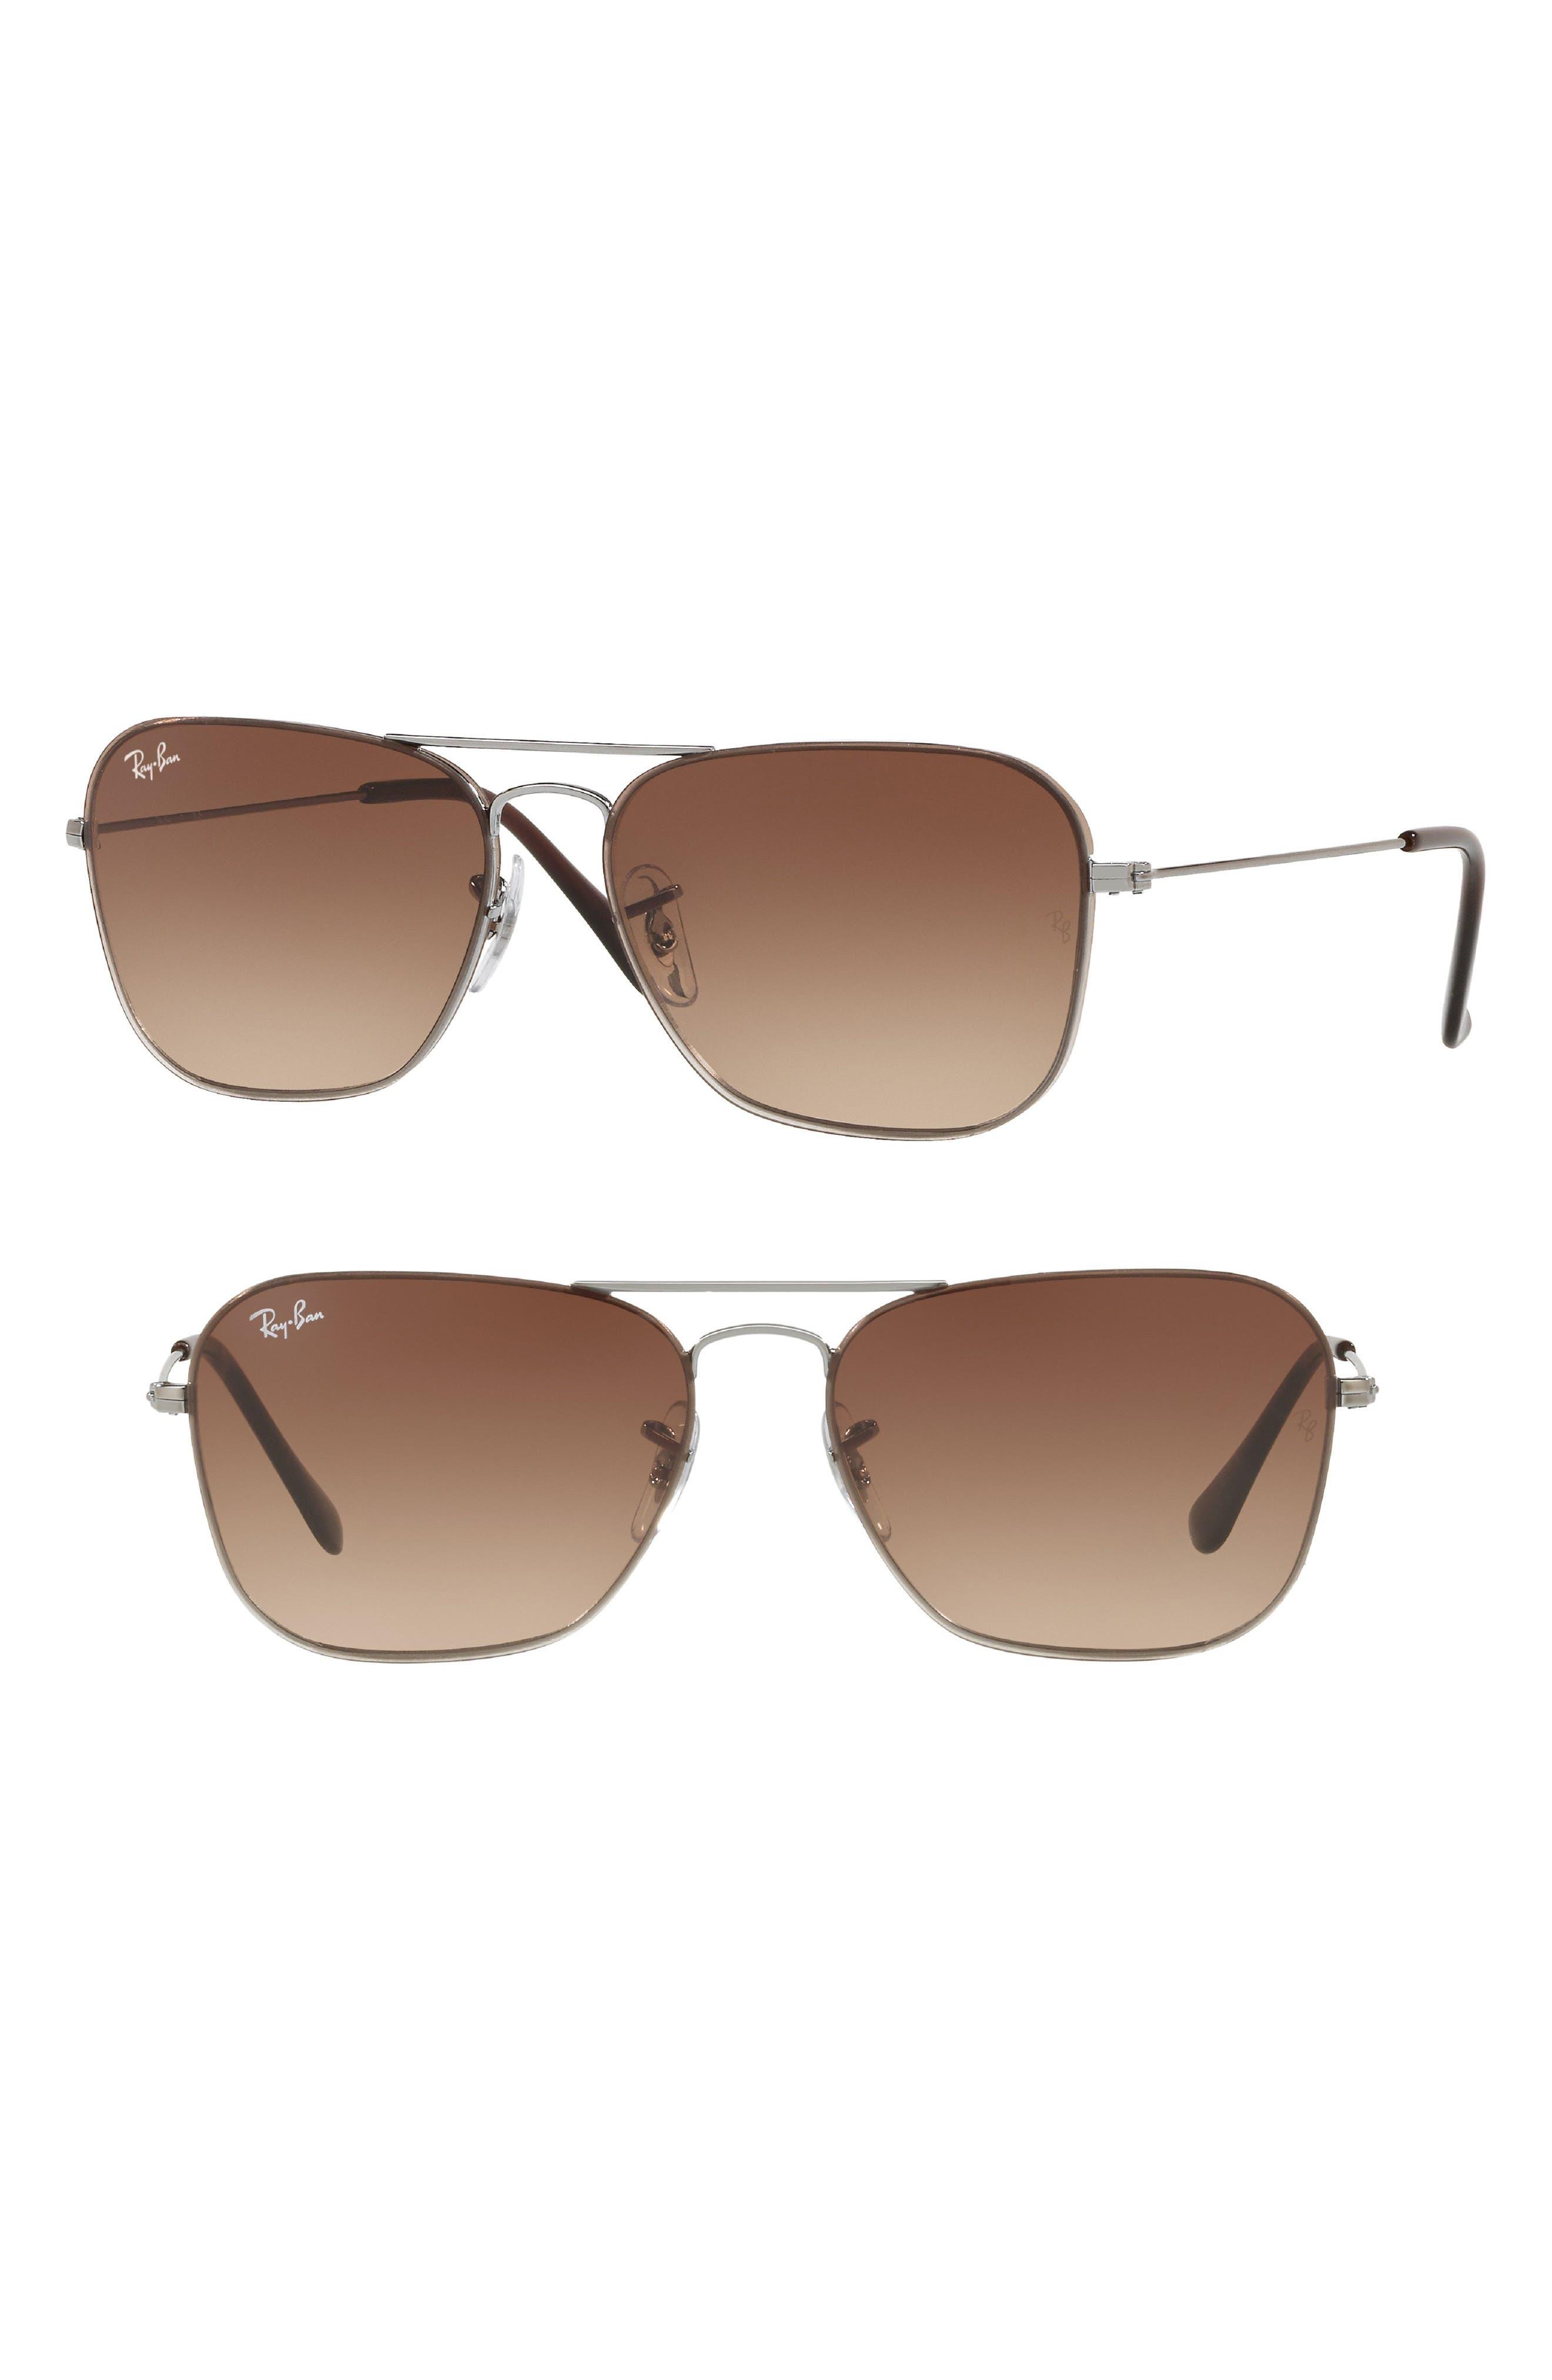 Youngster 56mm Aviator Sunglasses,                             Main thumbnail 1, color,                             Gunmetal